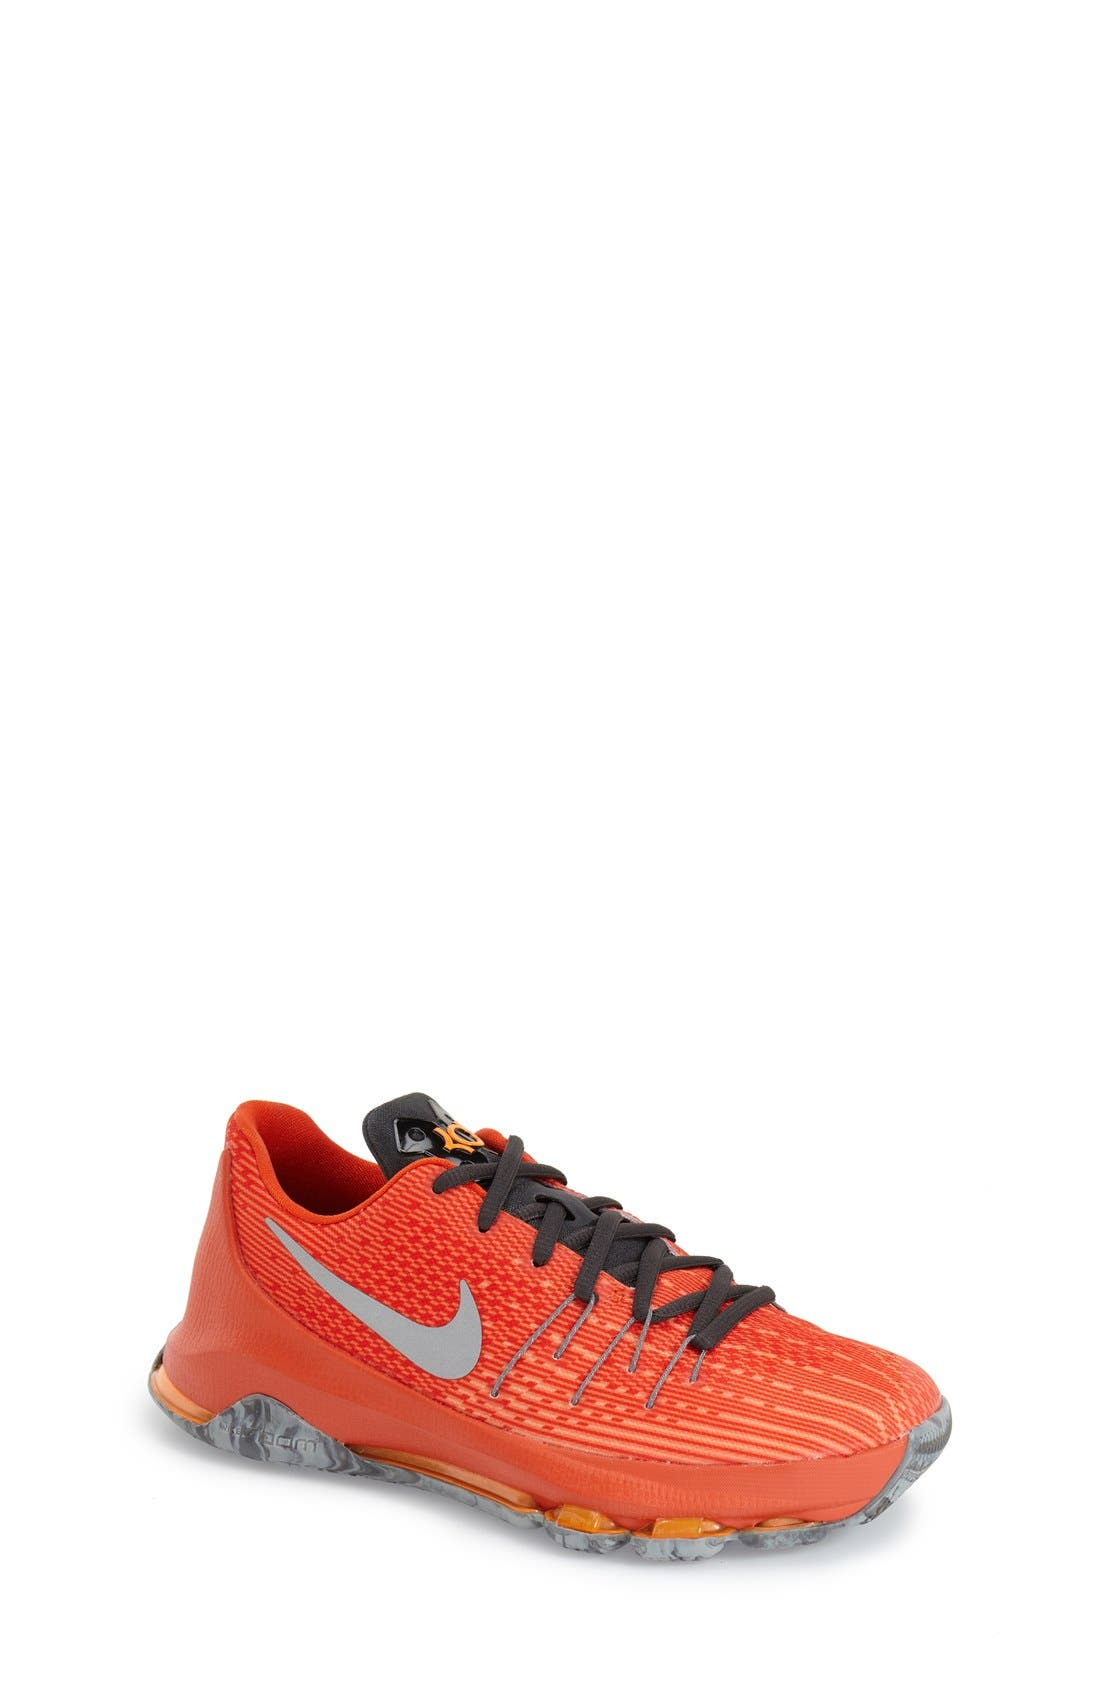 Nike KD 8 Basketball Shoe Big Kid